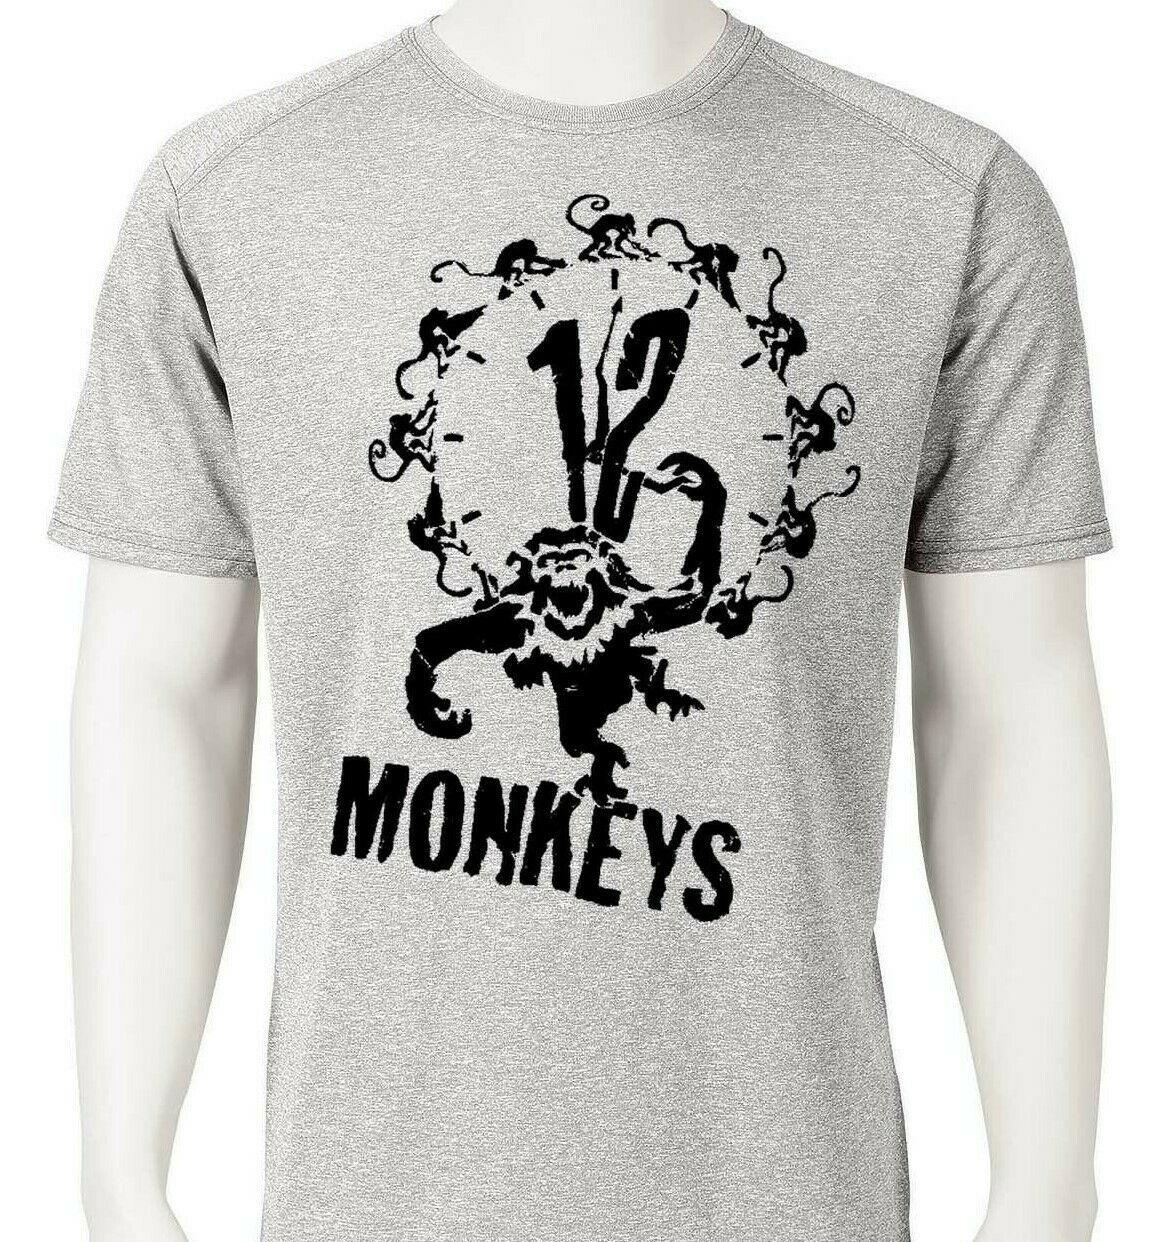 12 monkeys tee